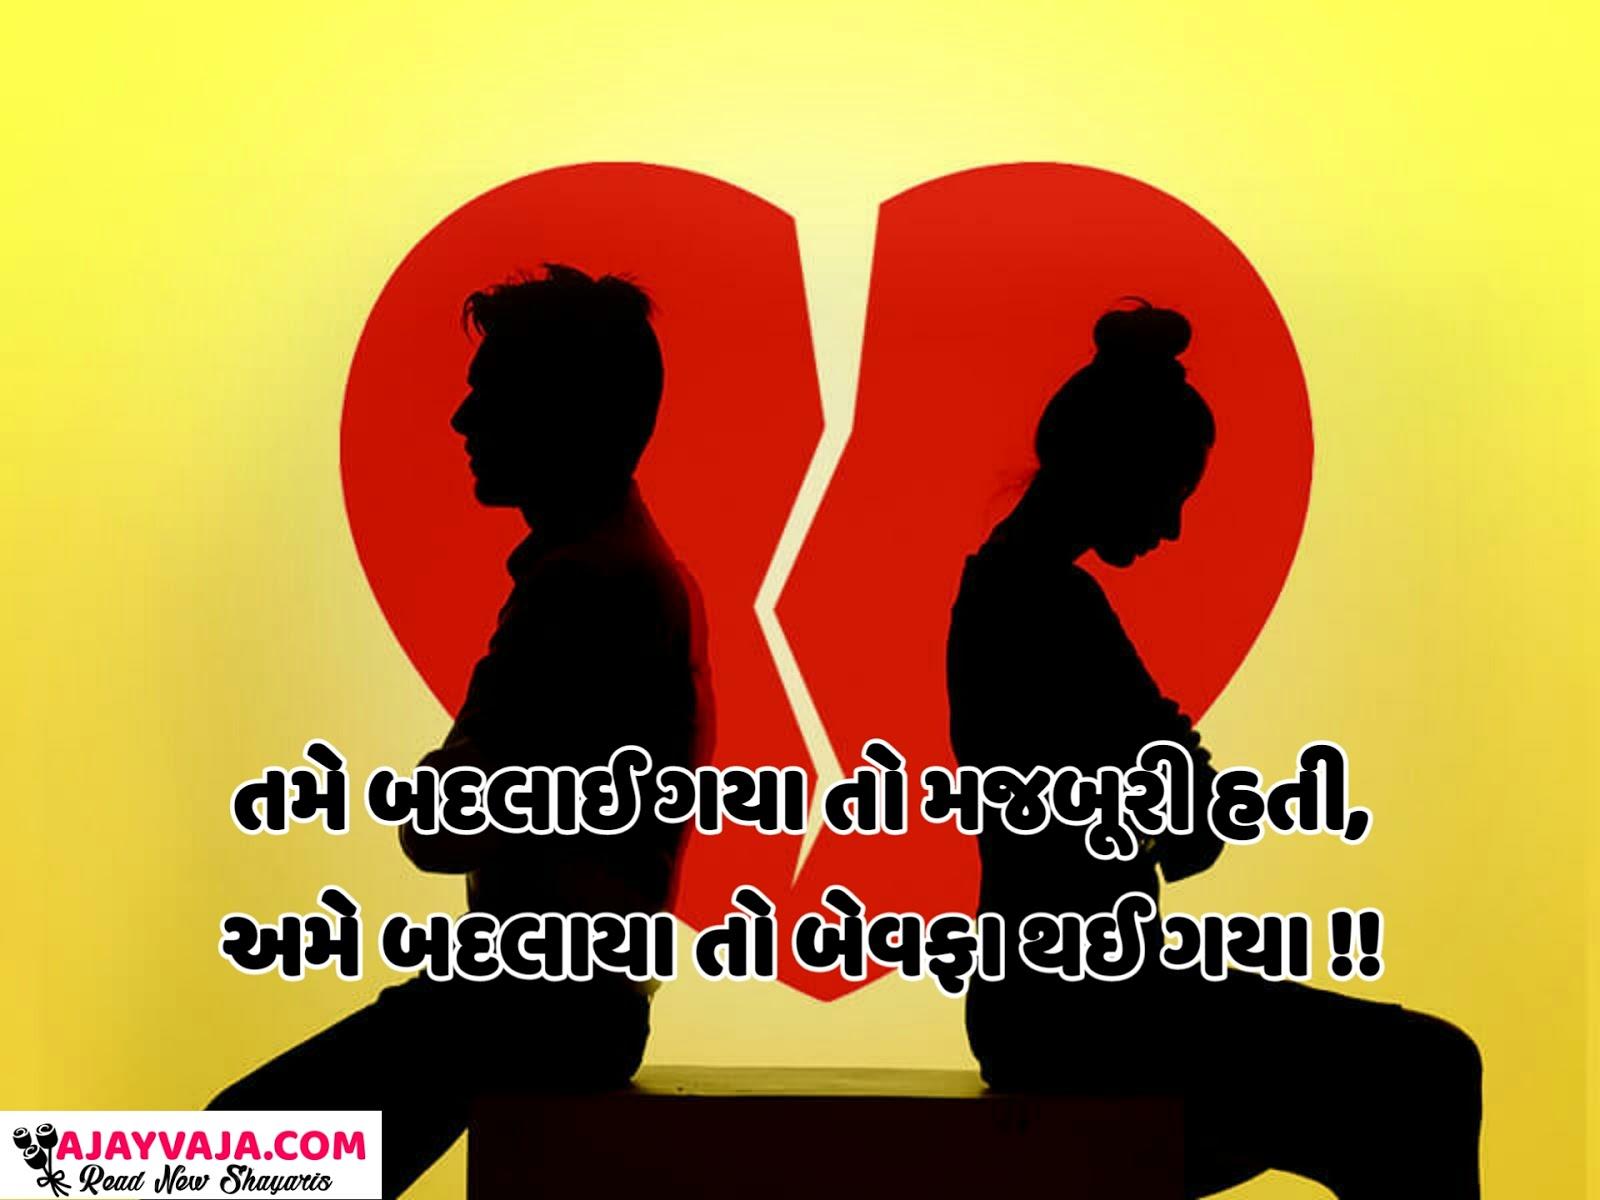 Gujarati bewafai shayari